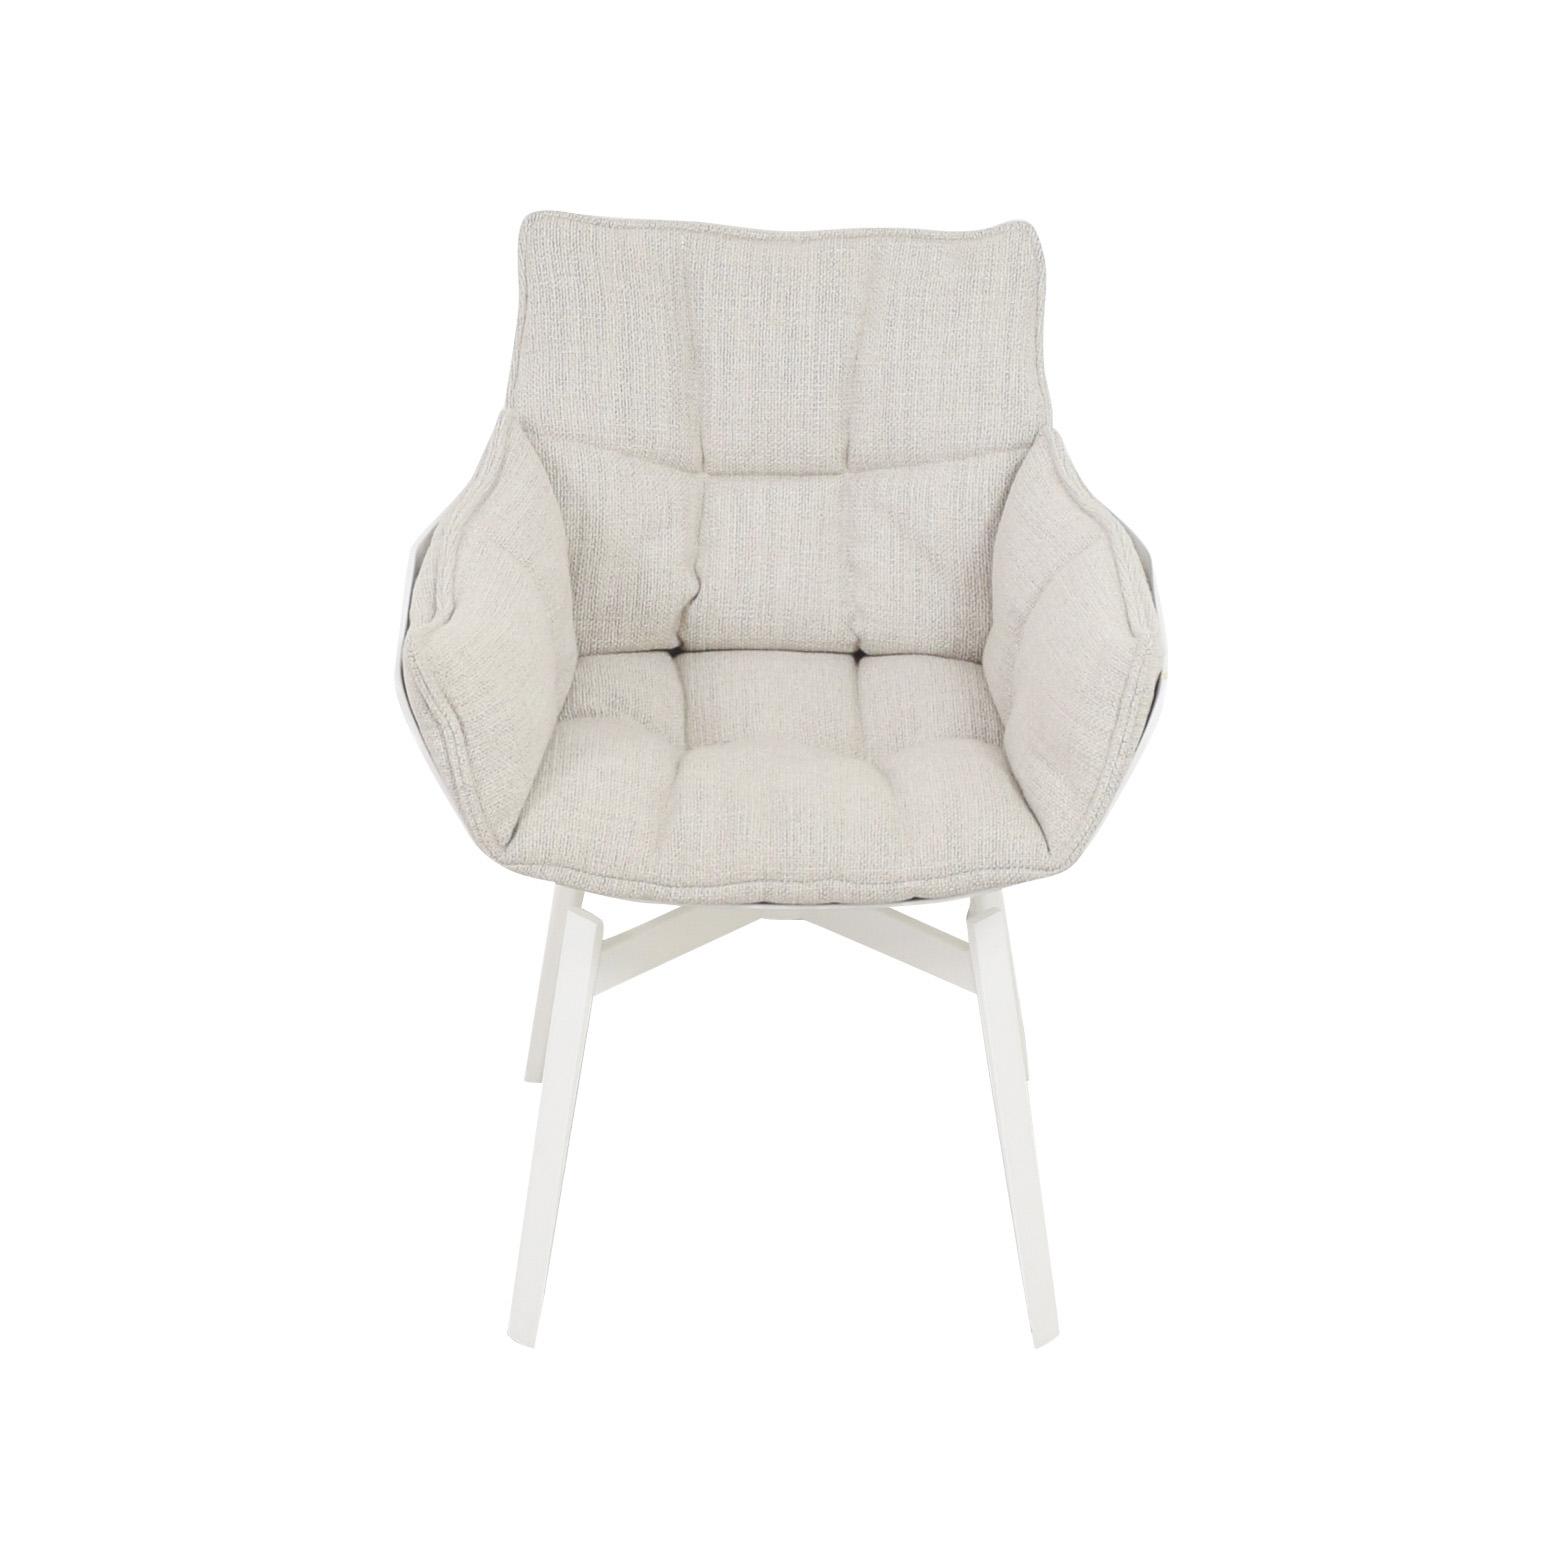 B&B Italia B&B Italia Husk Chair discount